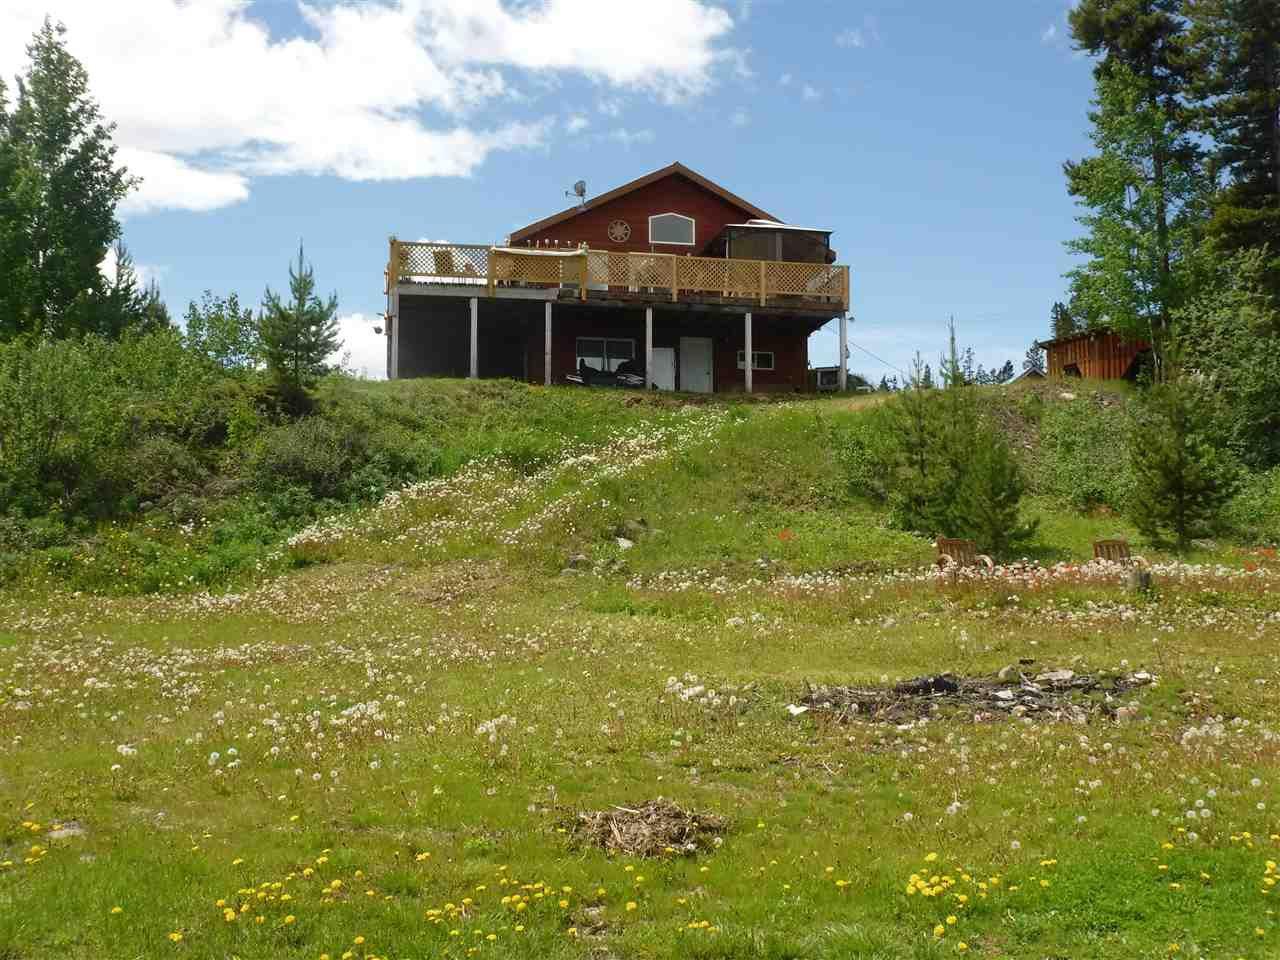 Photo 2: Photos: 3126 ELSEY Road in Williams Lake: Williams Lake - Rural West House for sale (Williams Lake (Zone 27))  : MLS®# R2467730